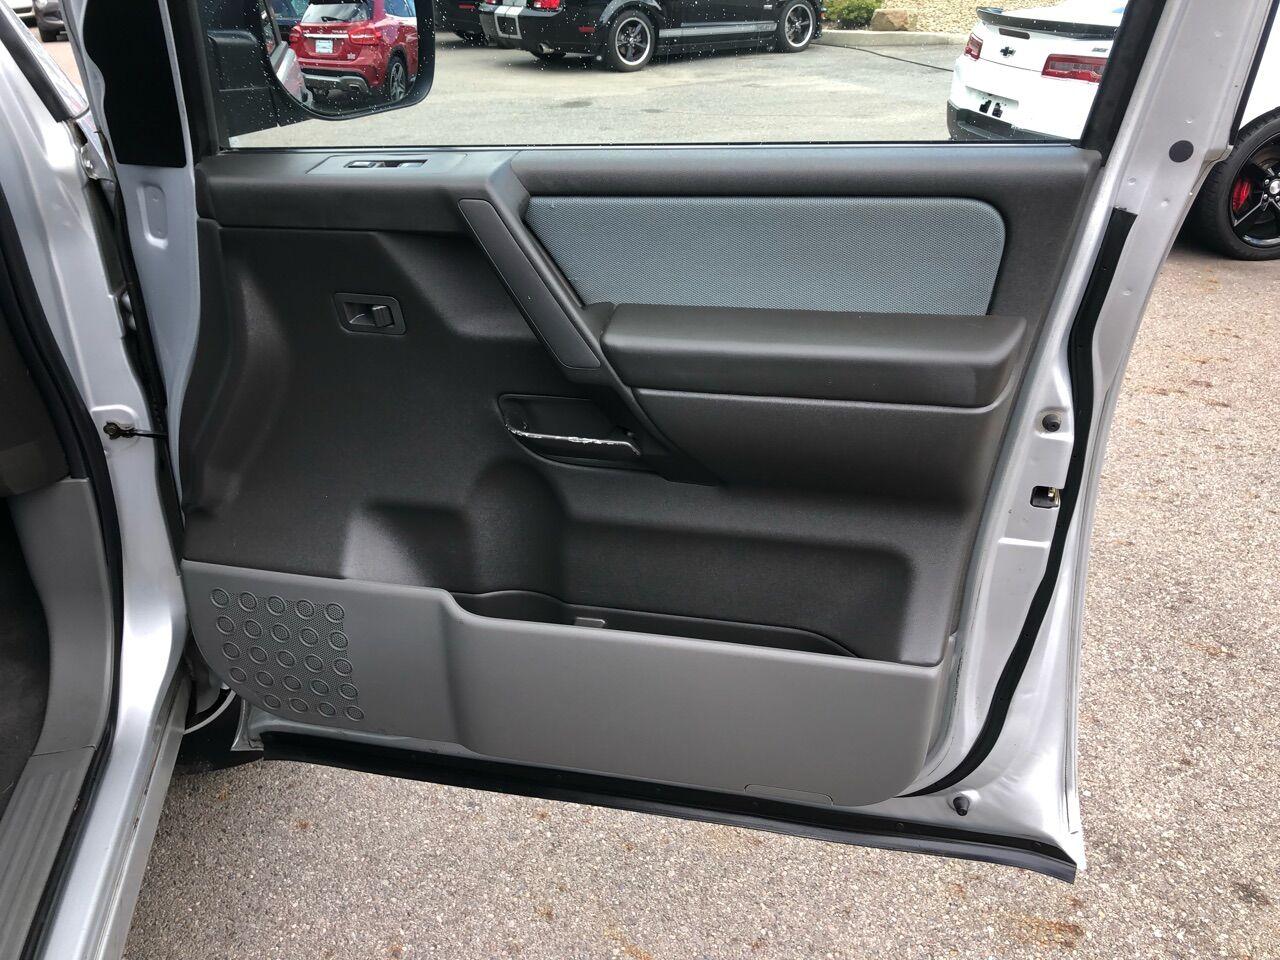 2007 Nissan Titan Short Bed